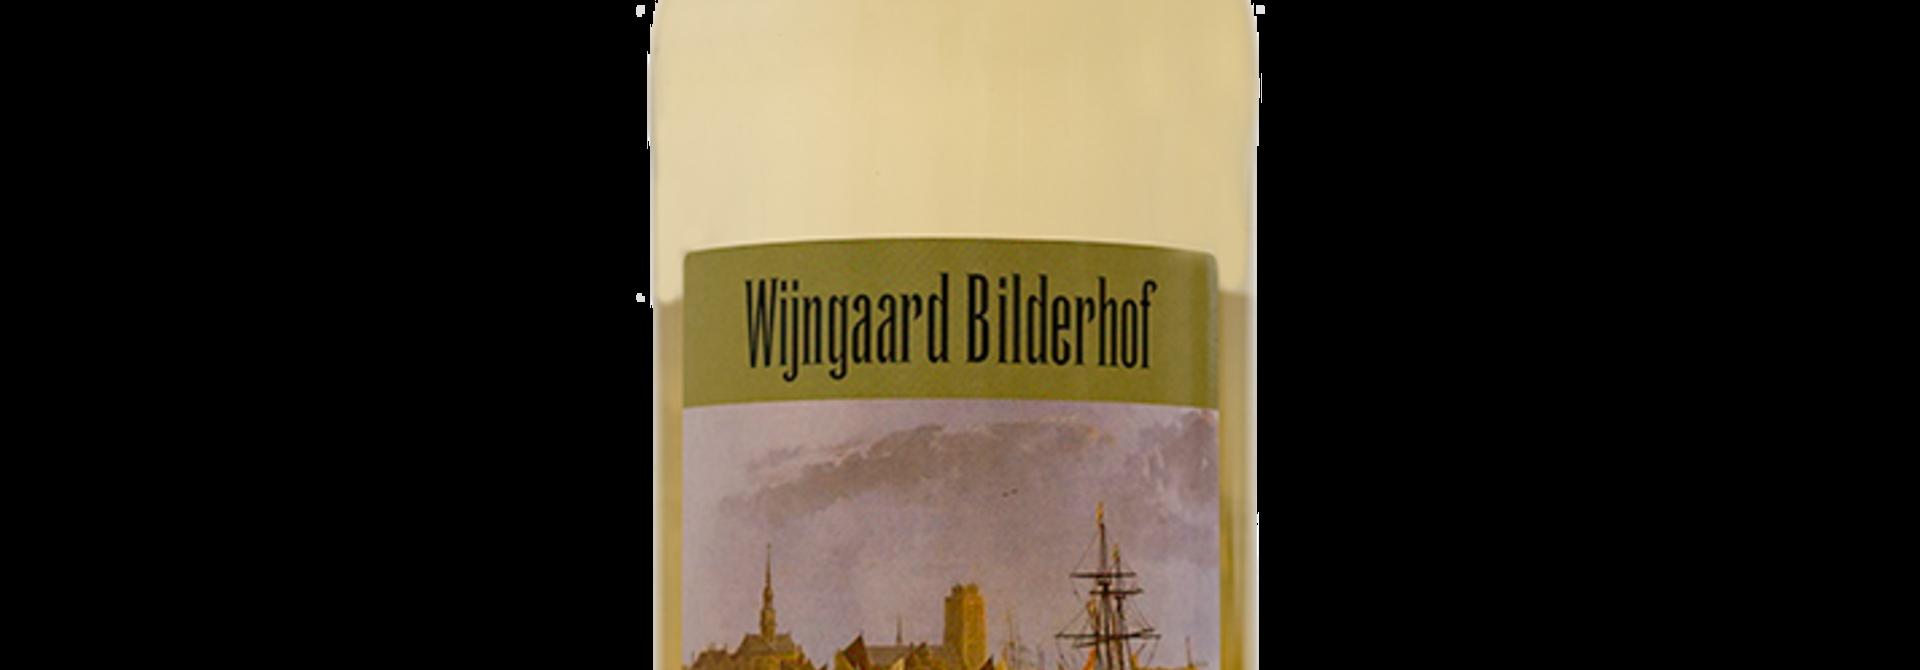 Bilderhof Johanniter